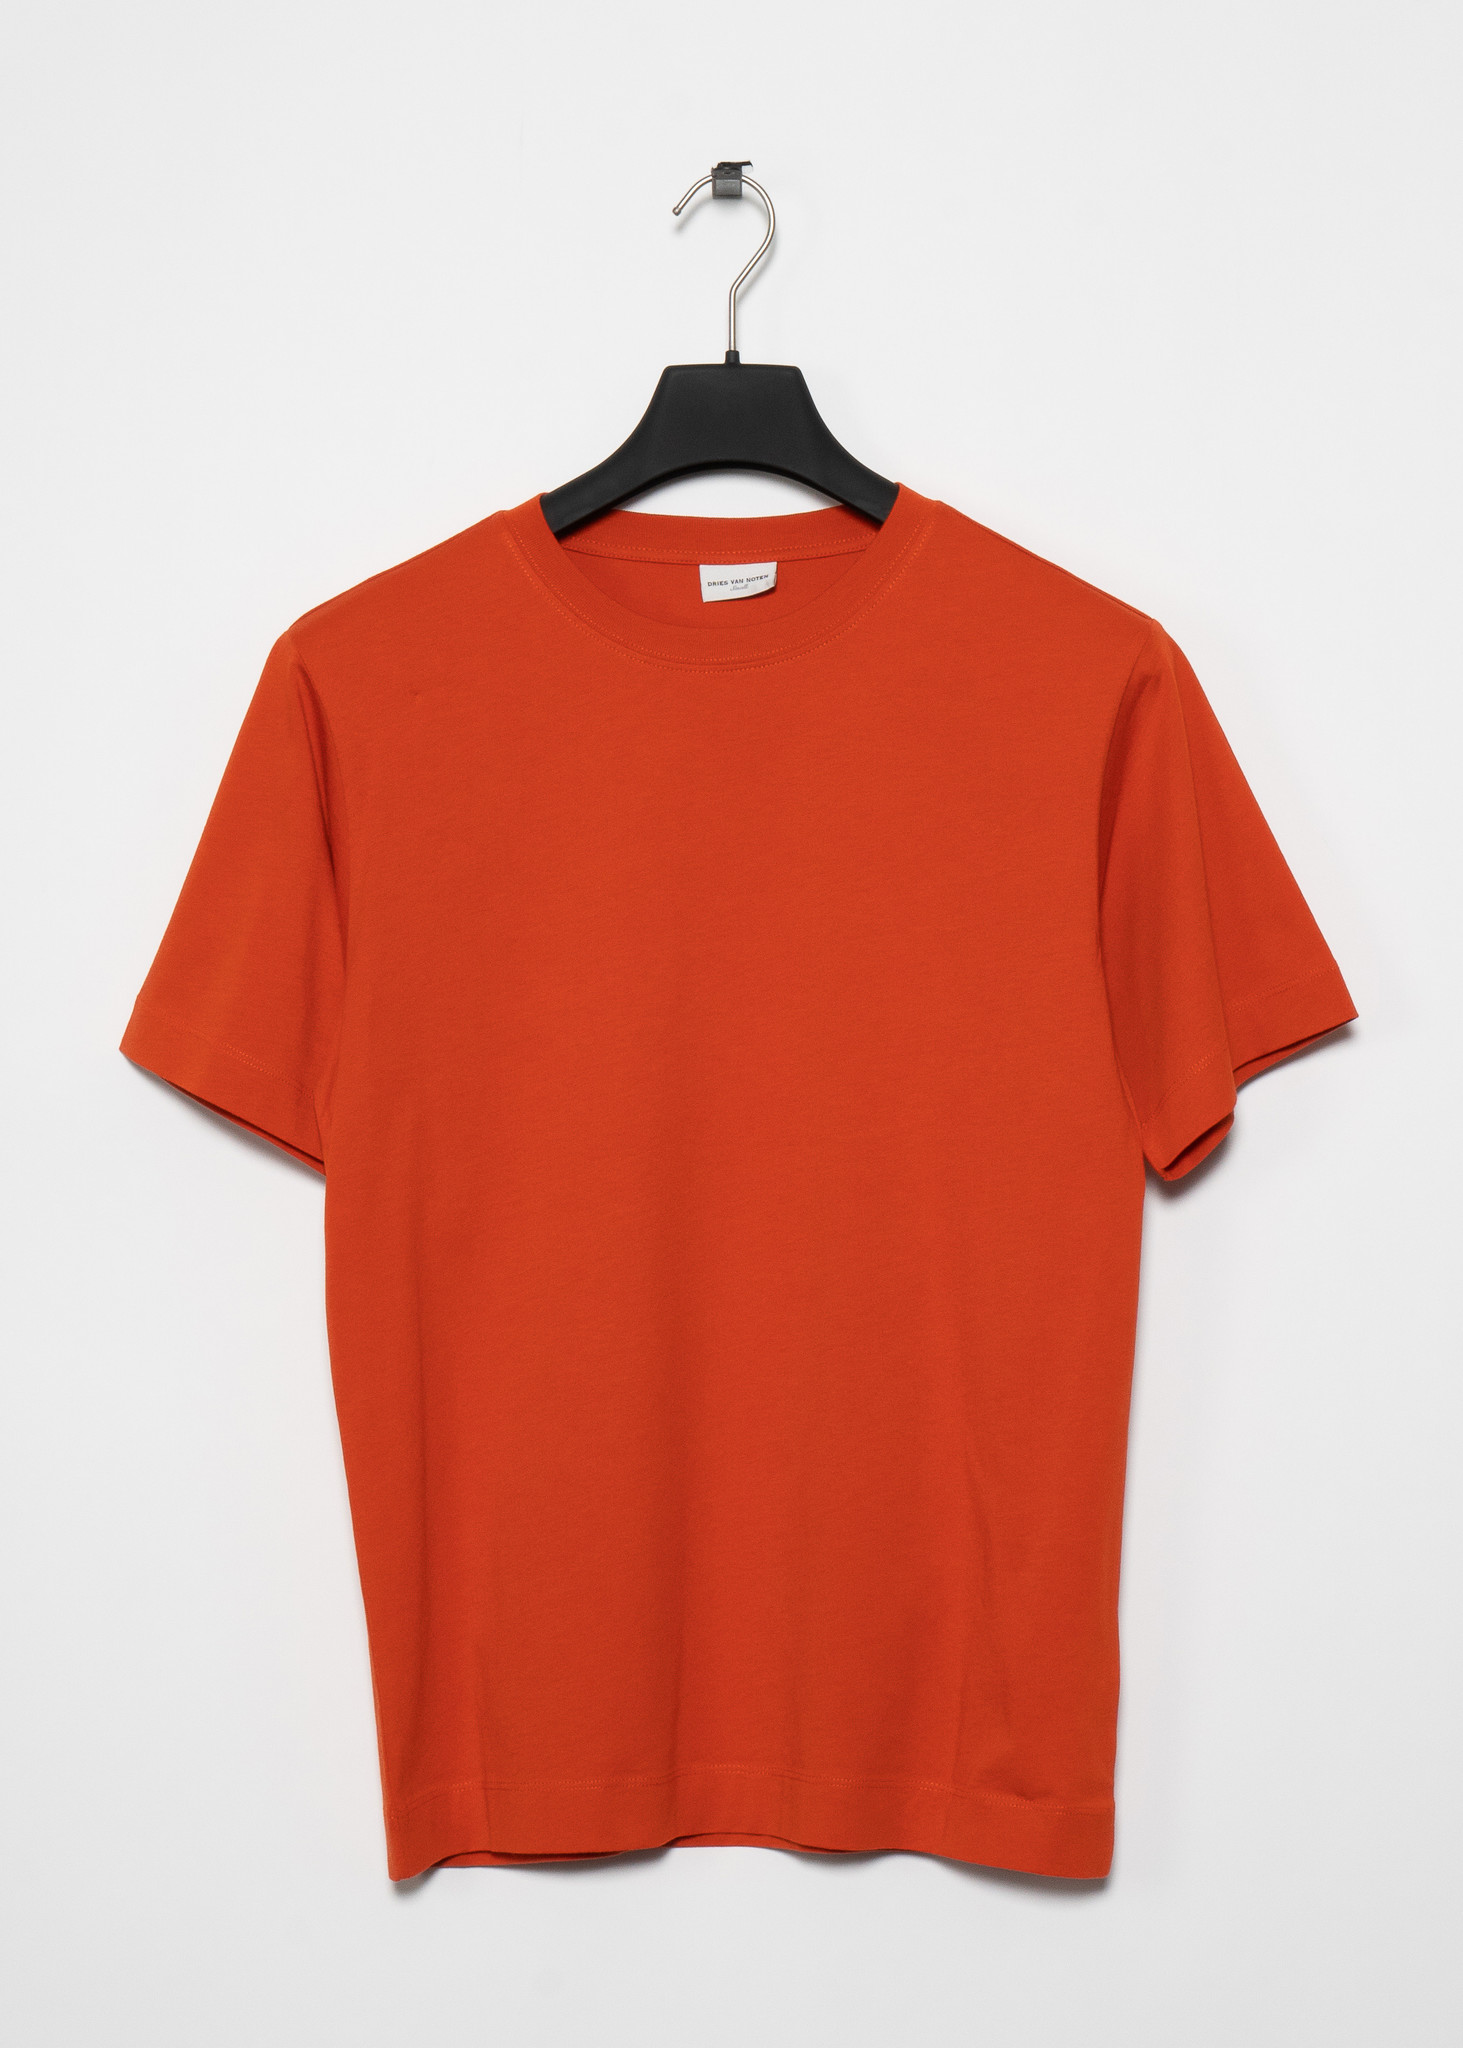 Vermillion T-Shirt